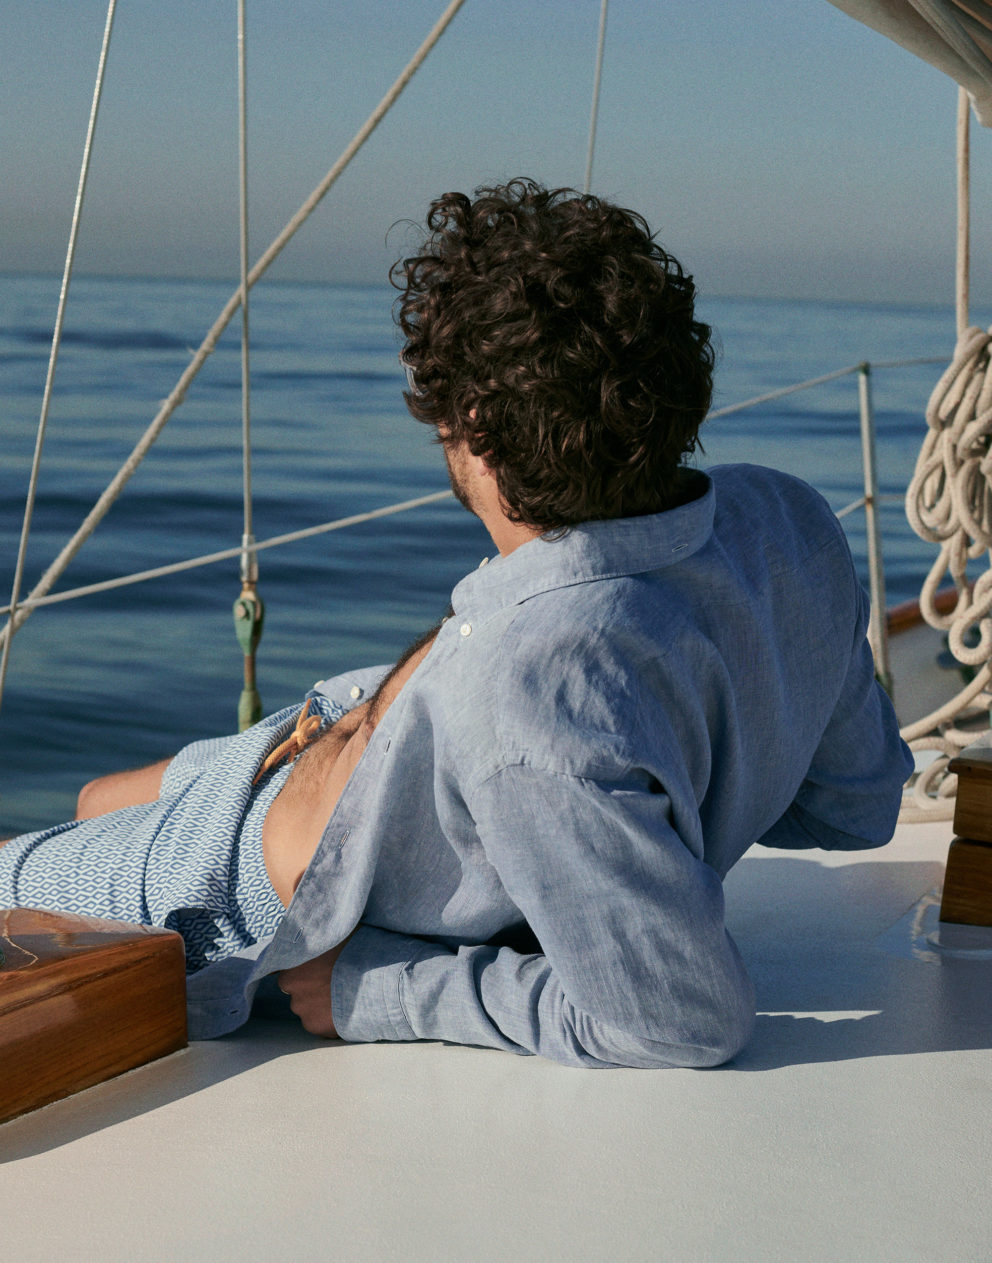 210319 0040 Eton Shirts Sailing La 185